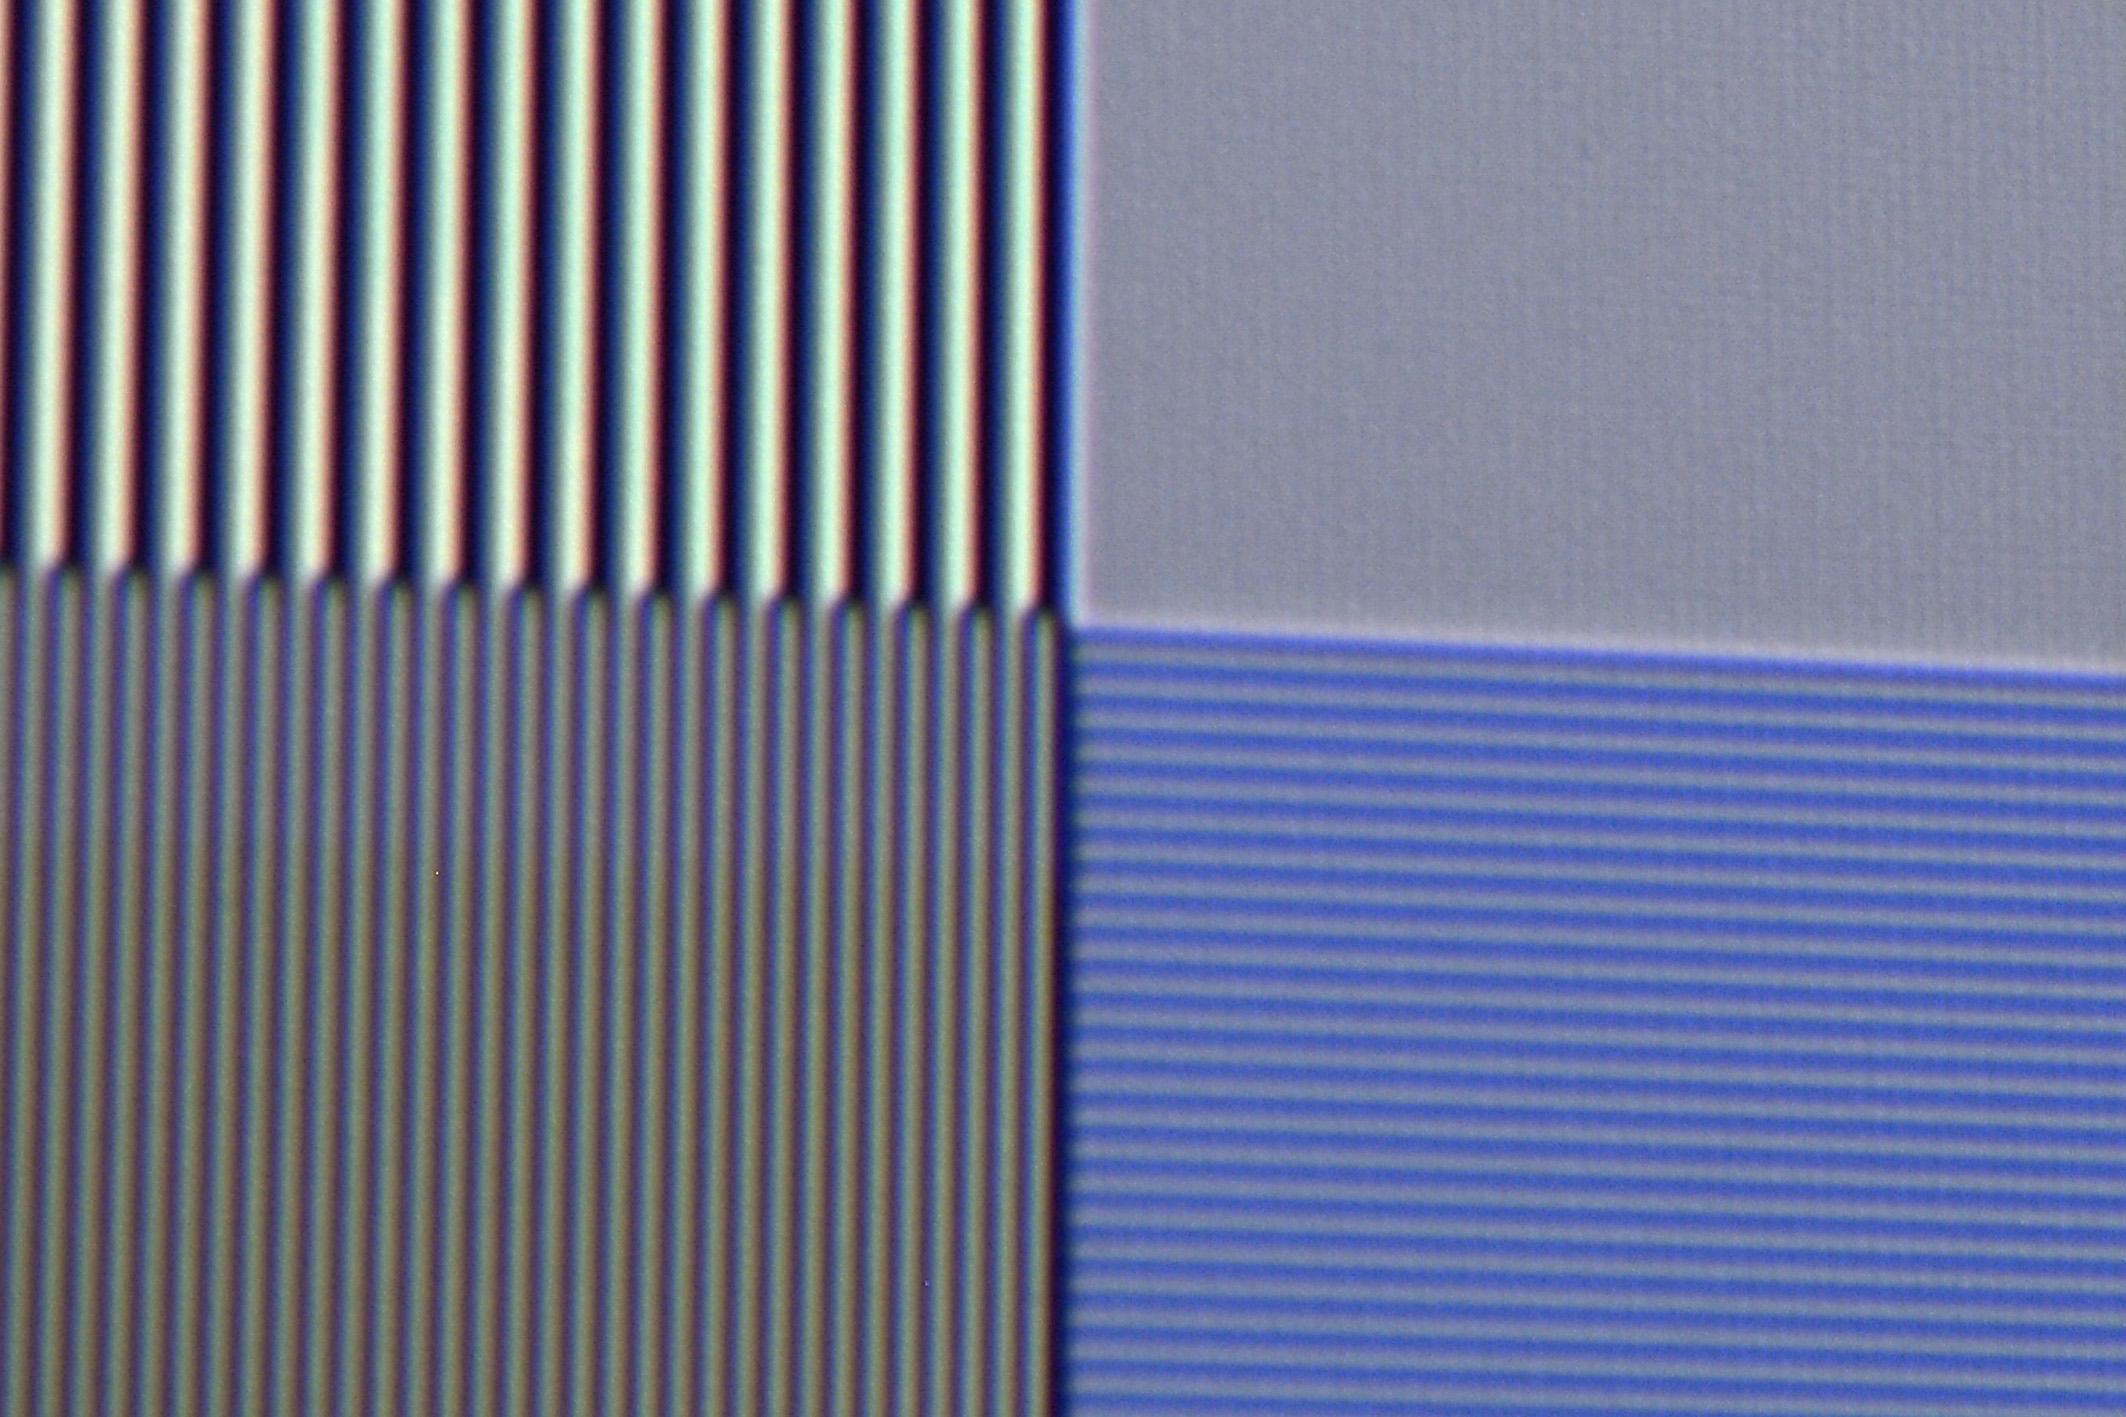 Sony VPL-VW550 - Auflösung UHD-Linien